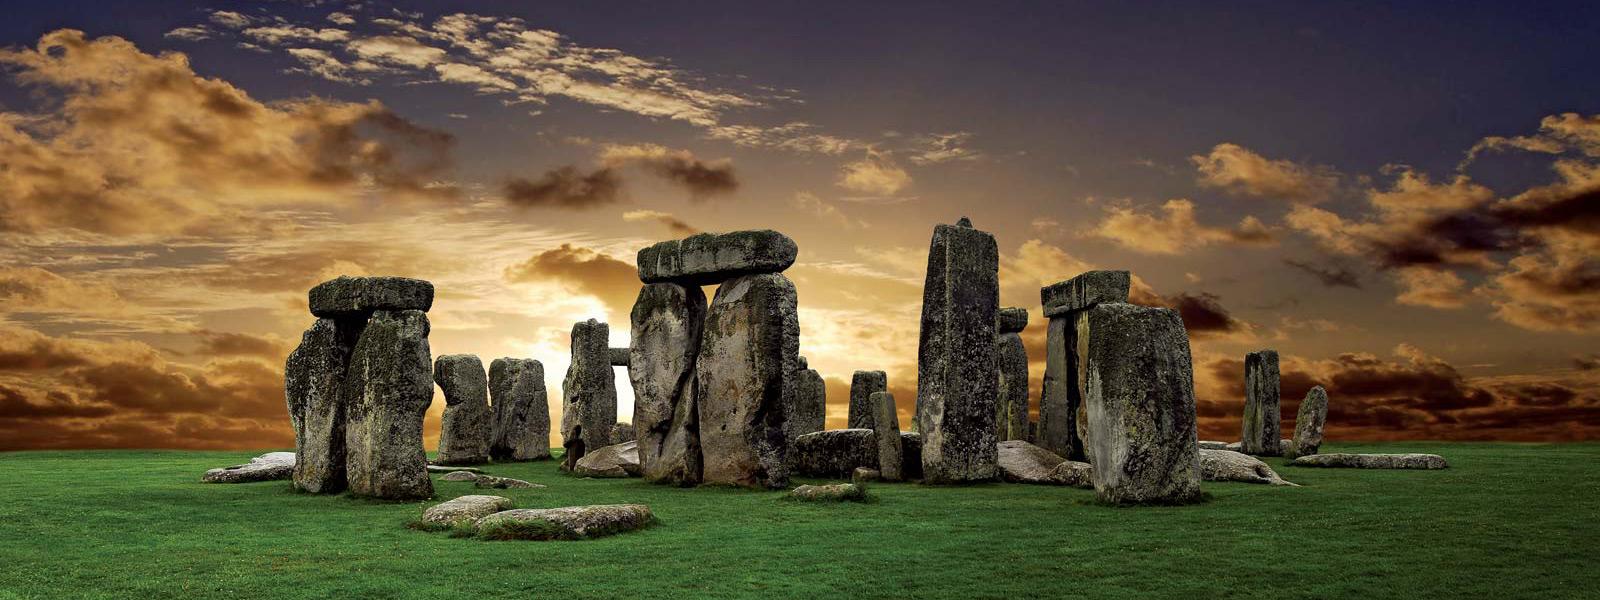 banner of stonehenge for the british history timeline